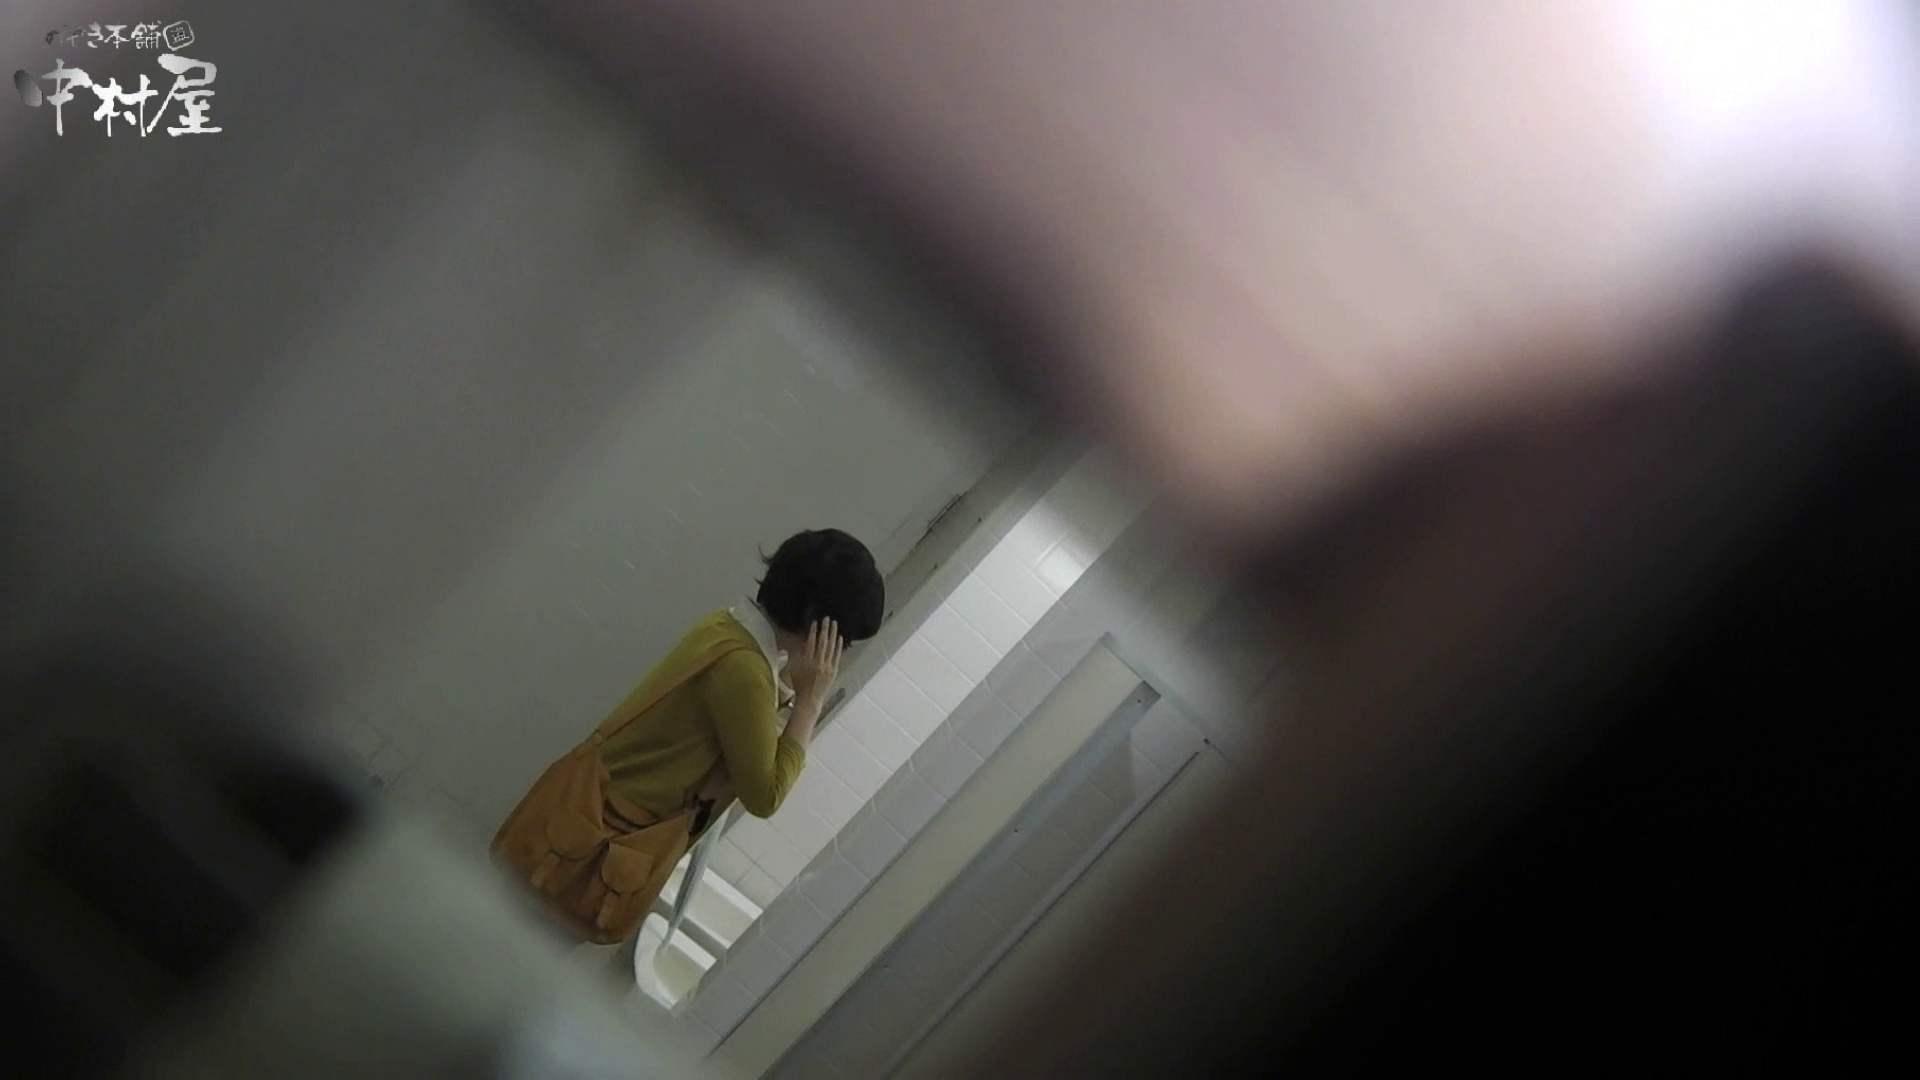 vol.54 命がけ潜伏洗面所! ヲリモノとろりん後編 プライベート  109連発 86